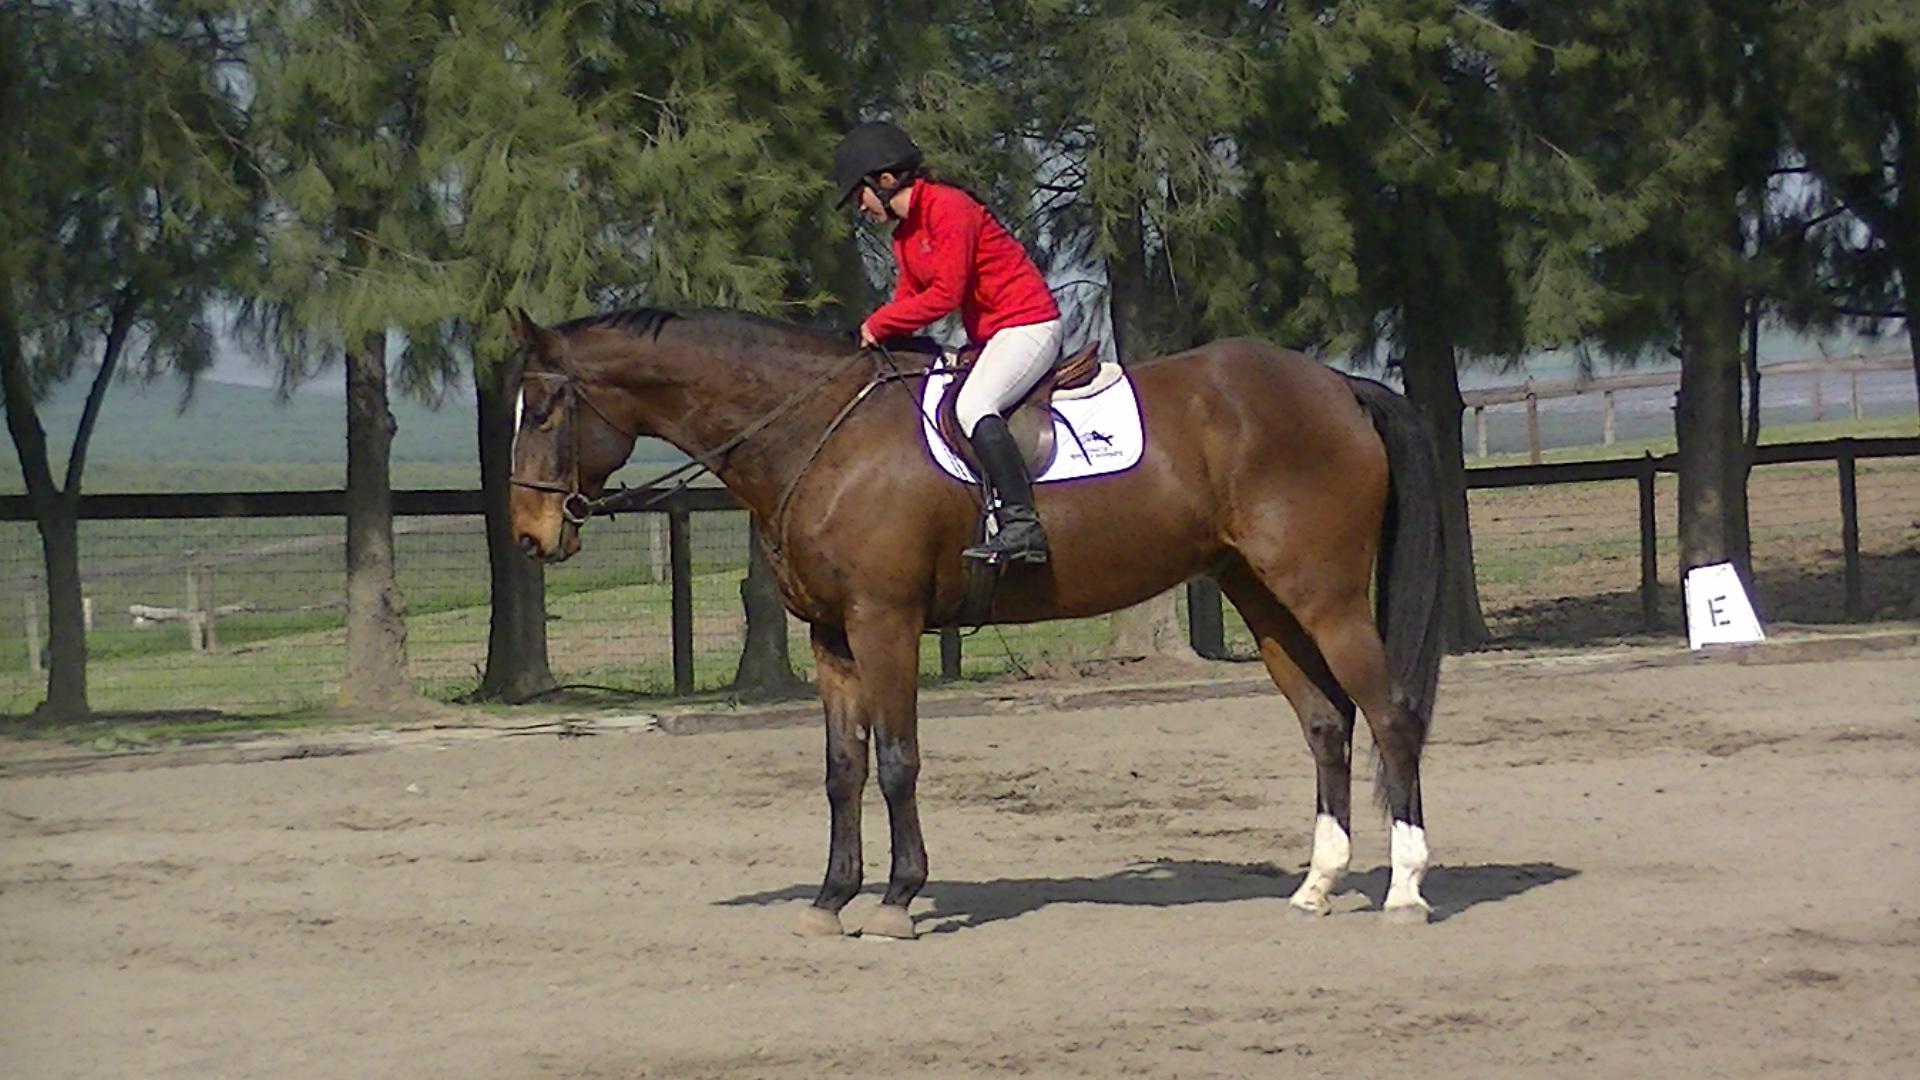 Rio S Rainbow Aka Oliver Gracesporthorses2